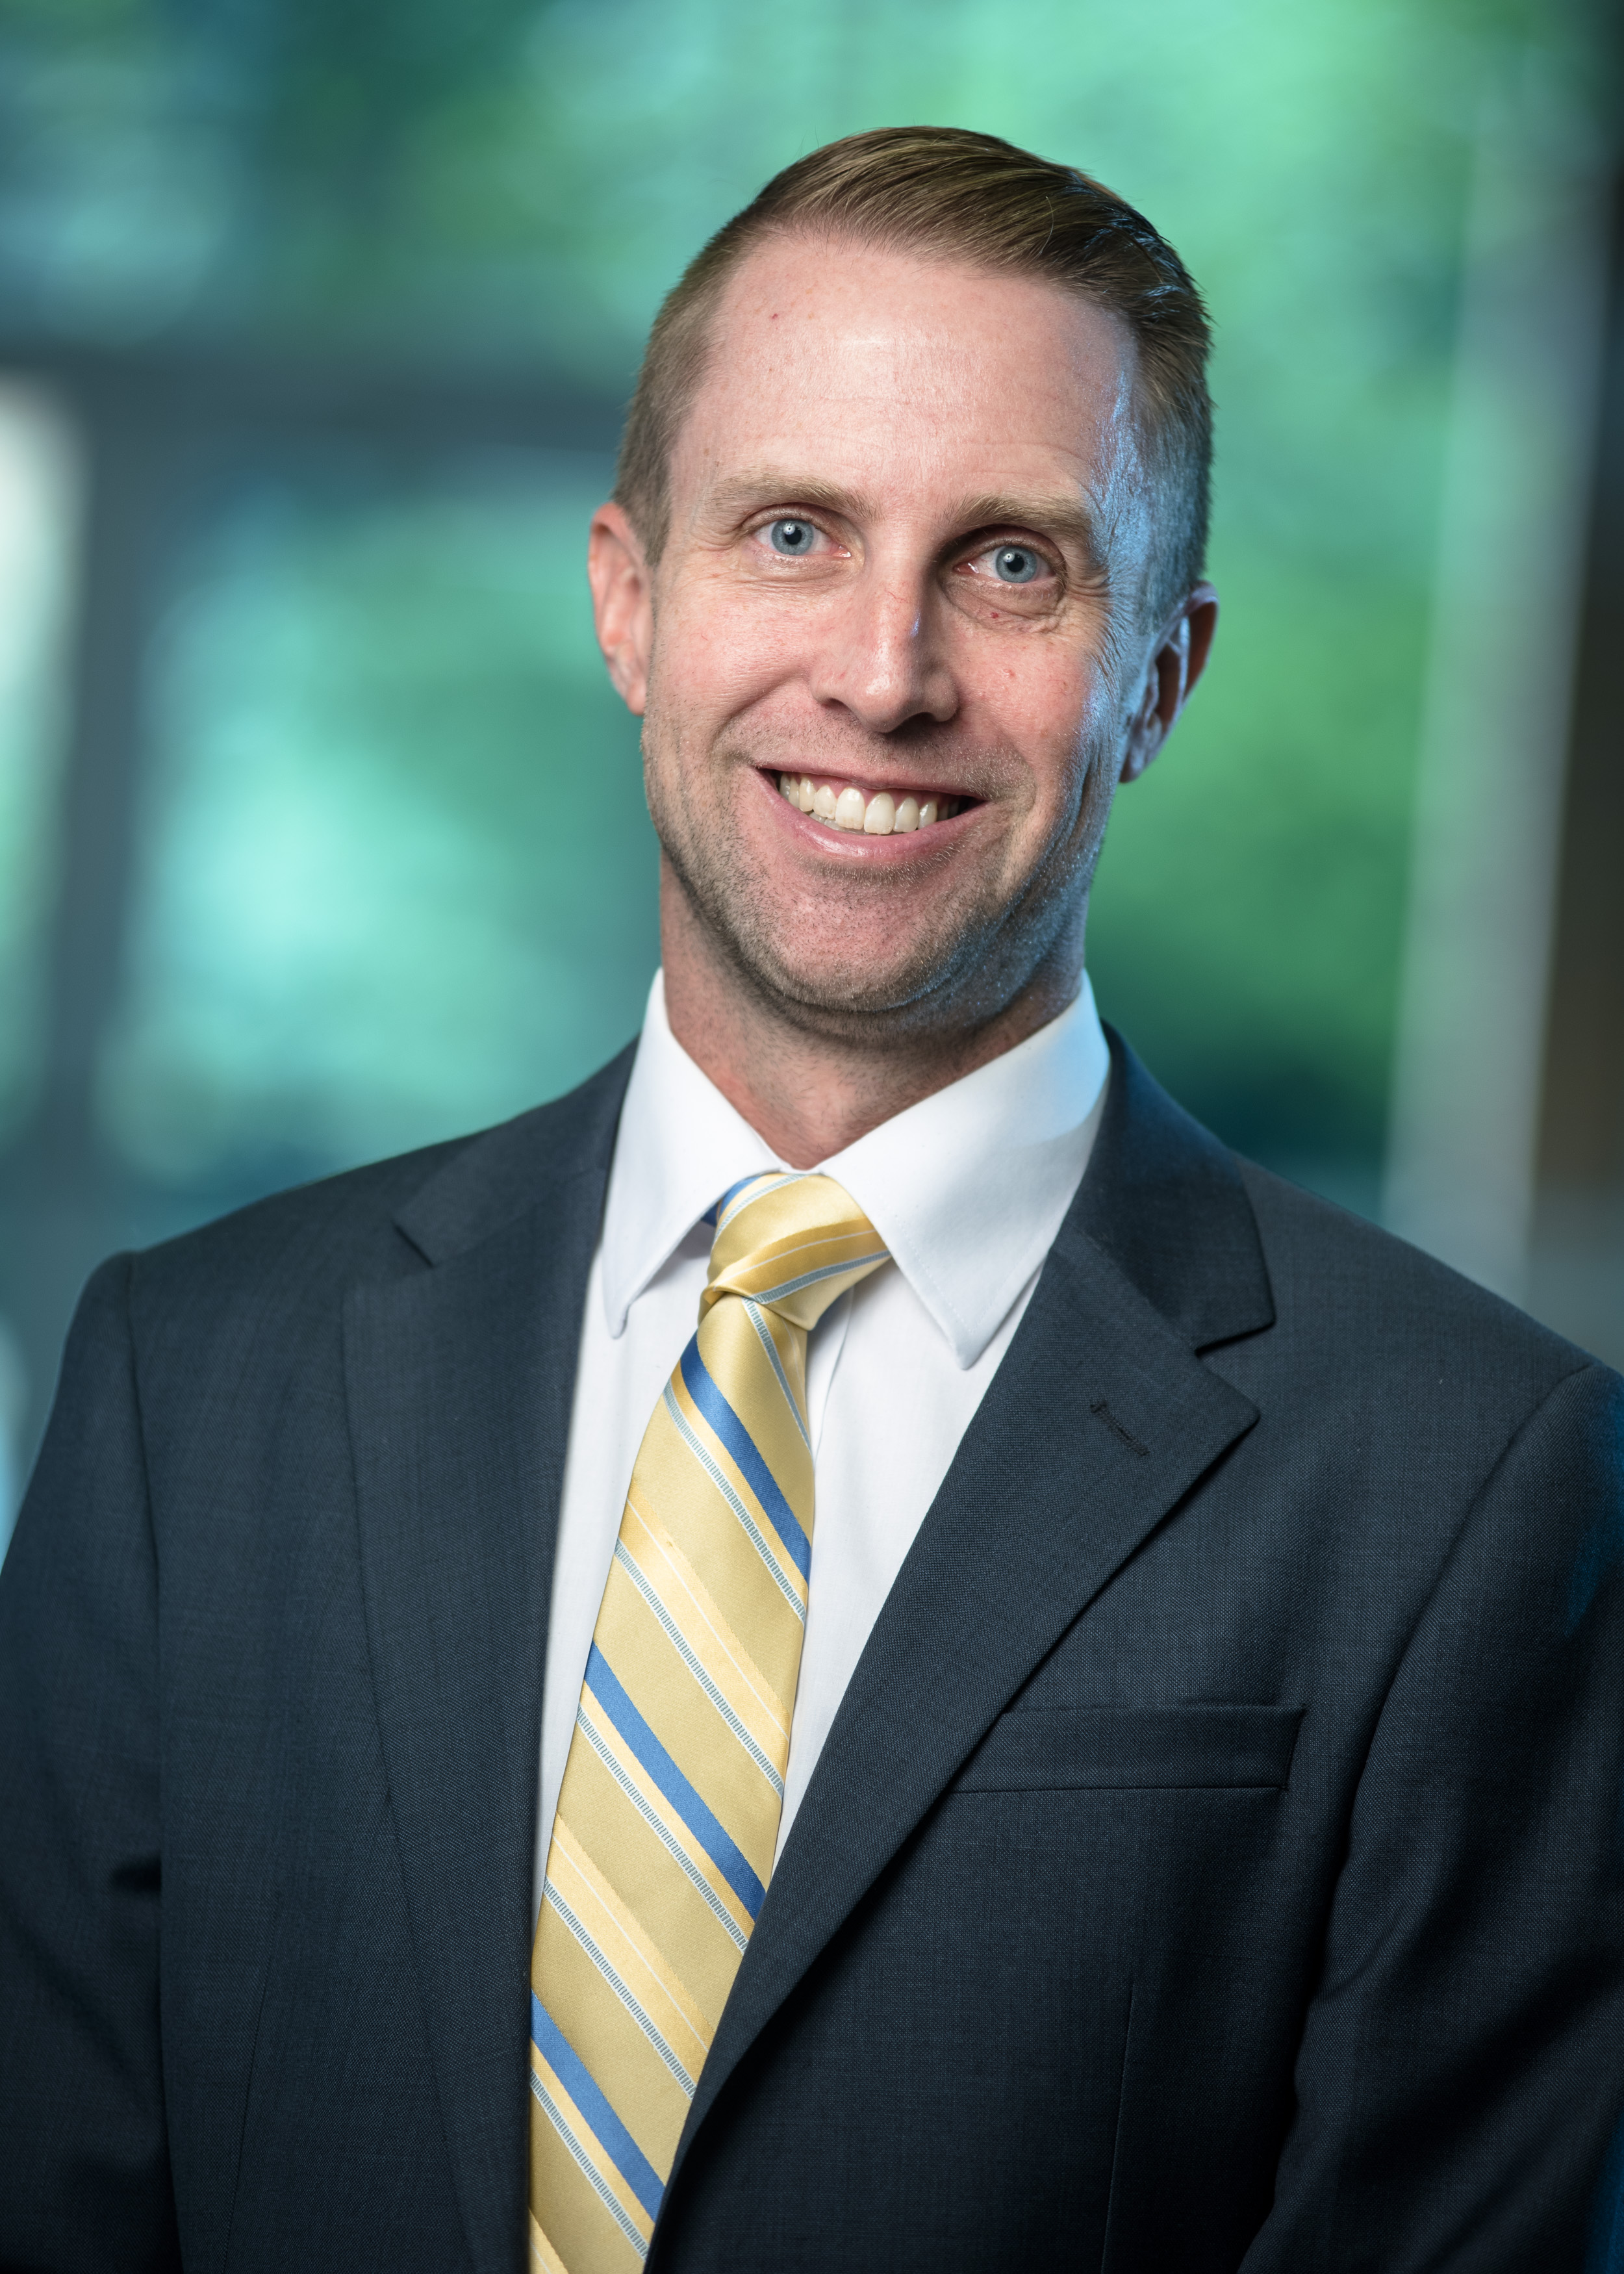 Ryan Angus, Ph.D.